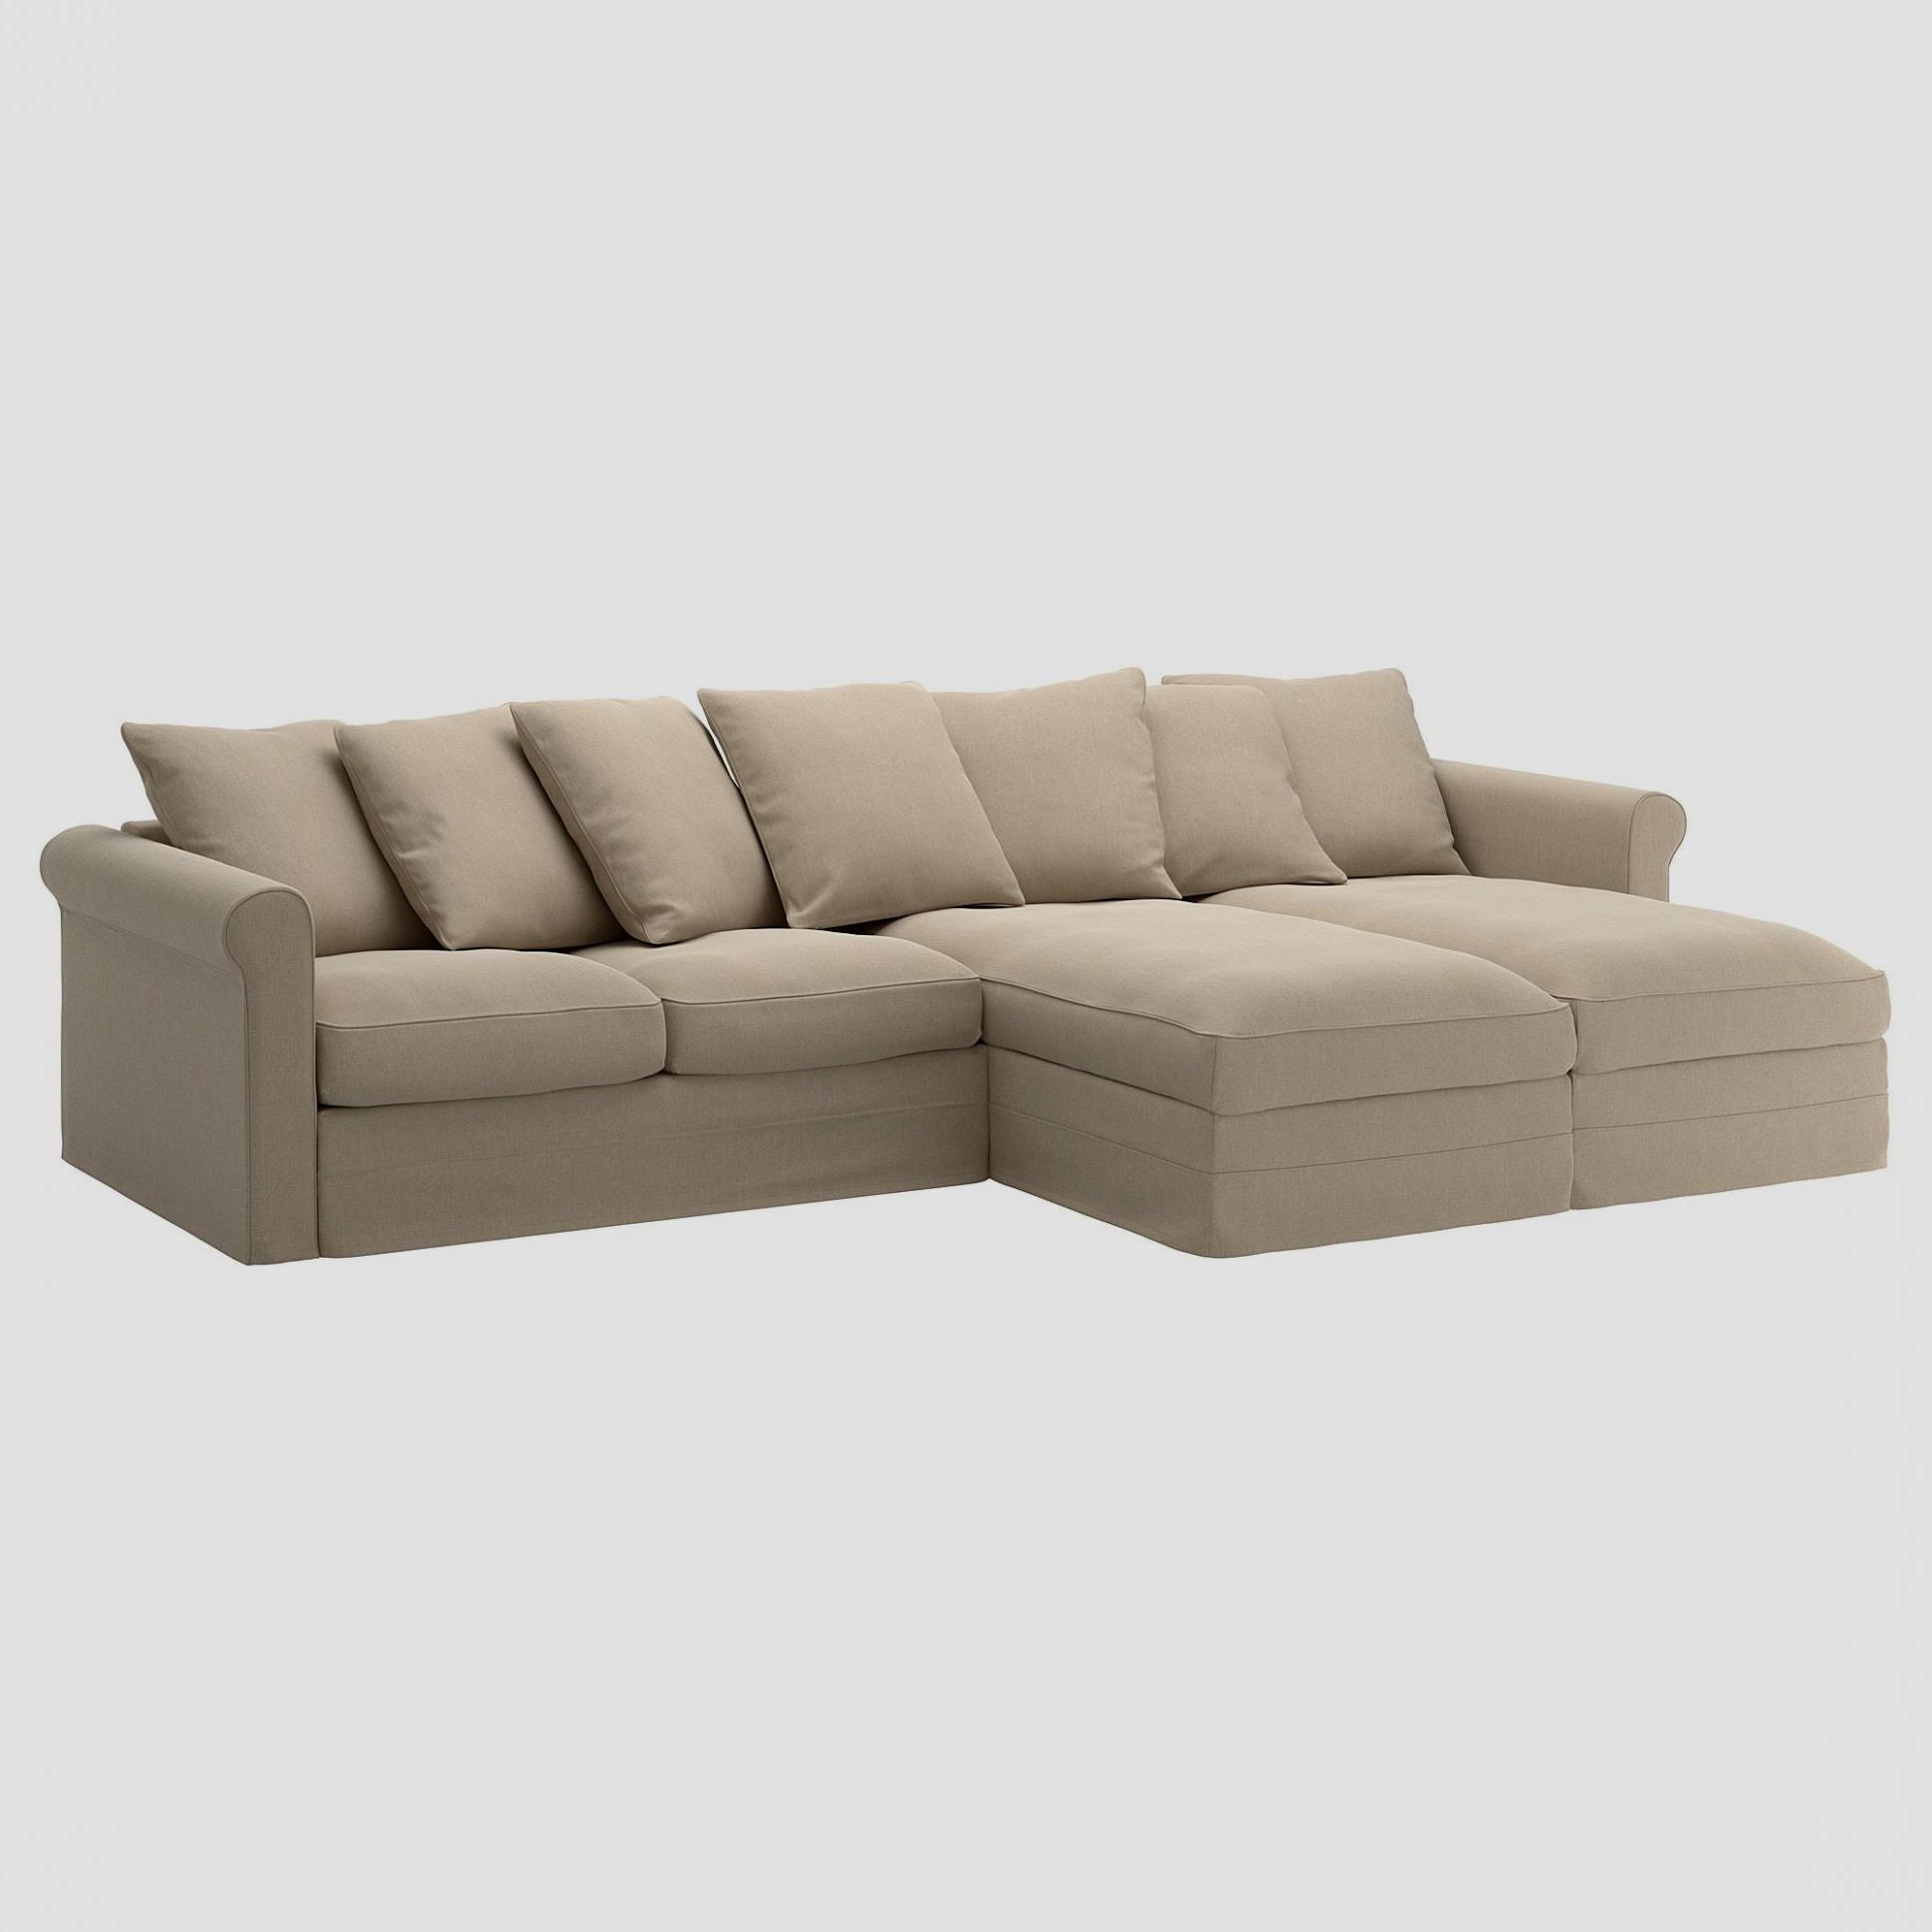 Ikea sofas Modulares E9dx sofas Rinconeras Modulares Magnifico sofa Ikea Leder Busco Sillas